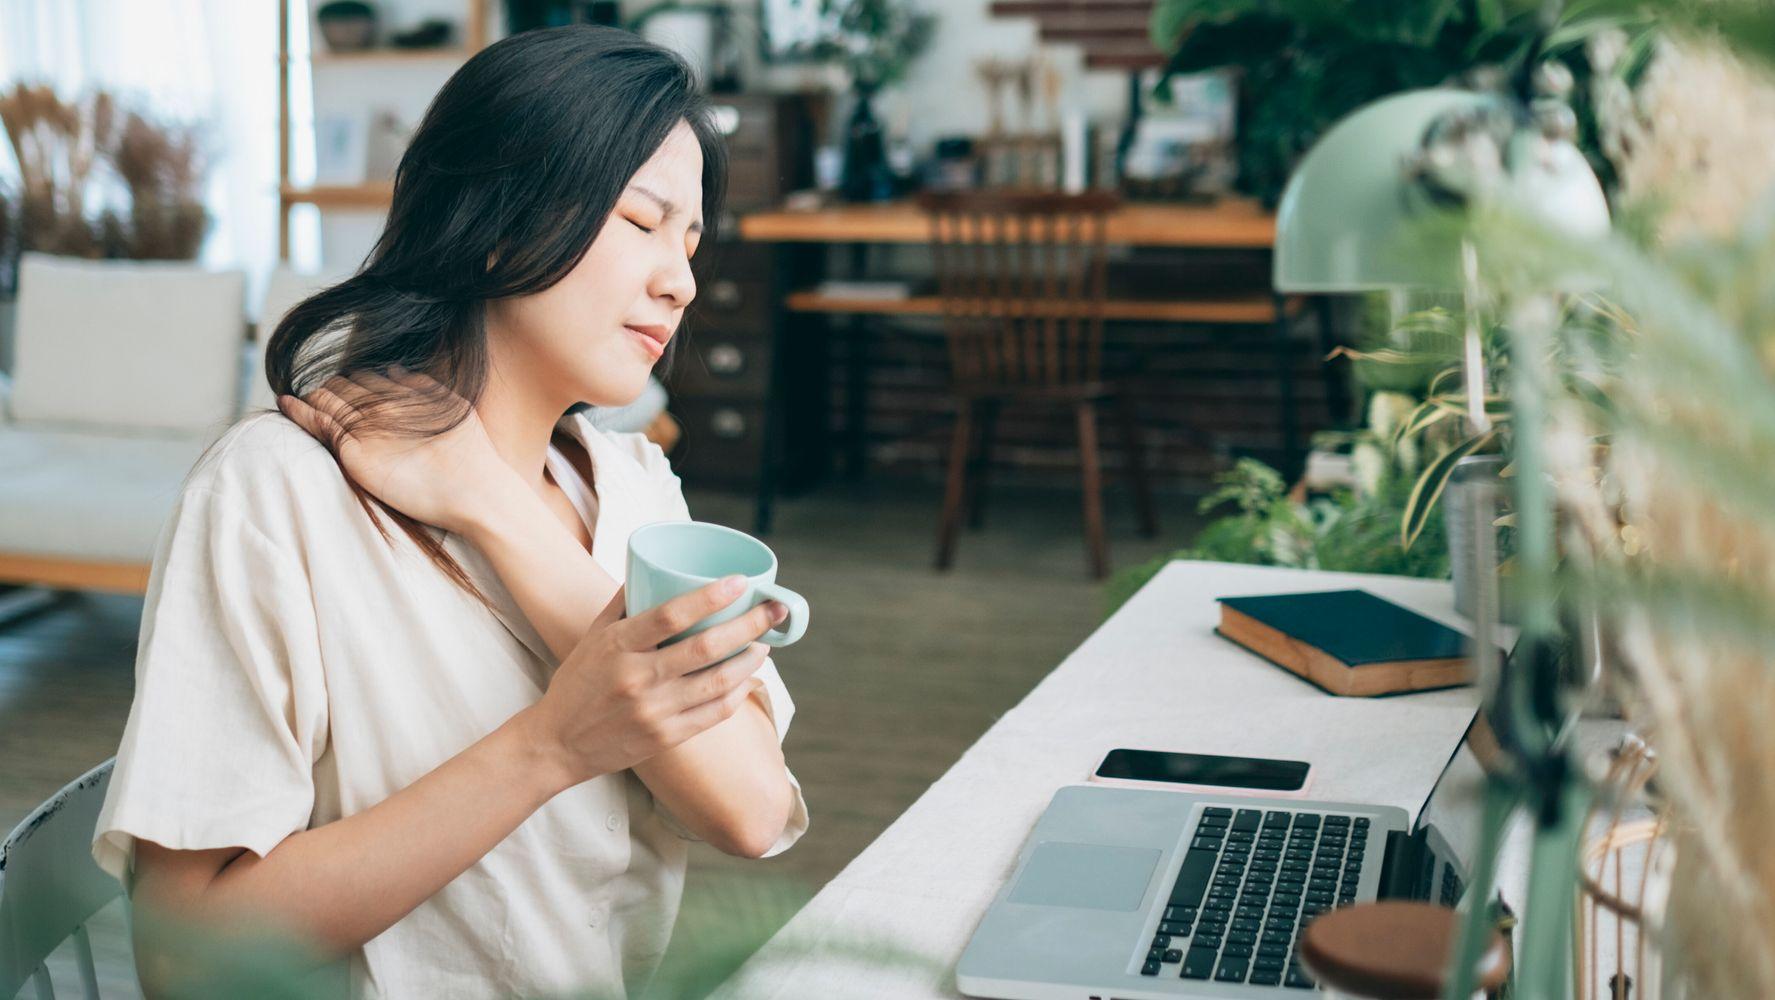 9 Desk And Chair Hacks To Make WFH More Bearable